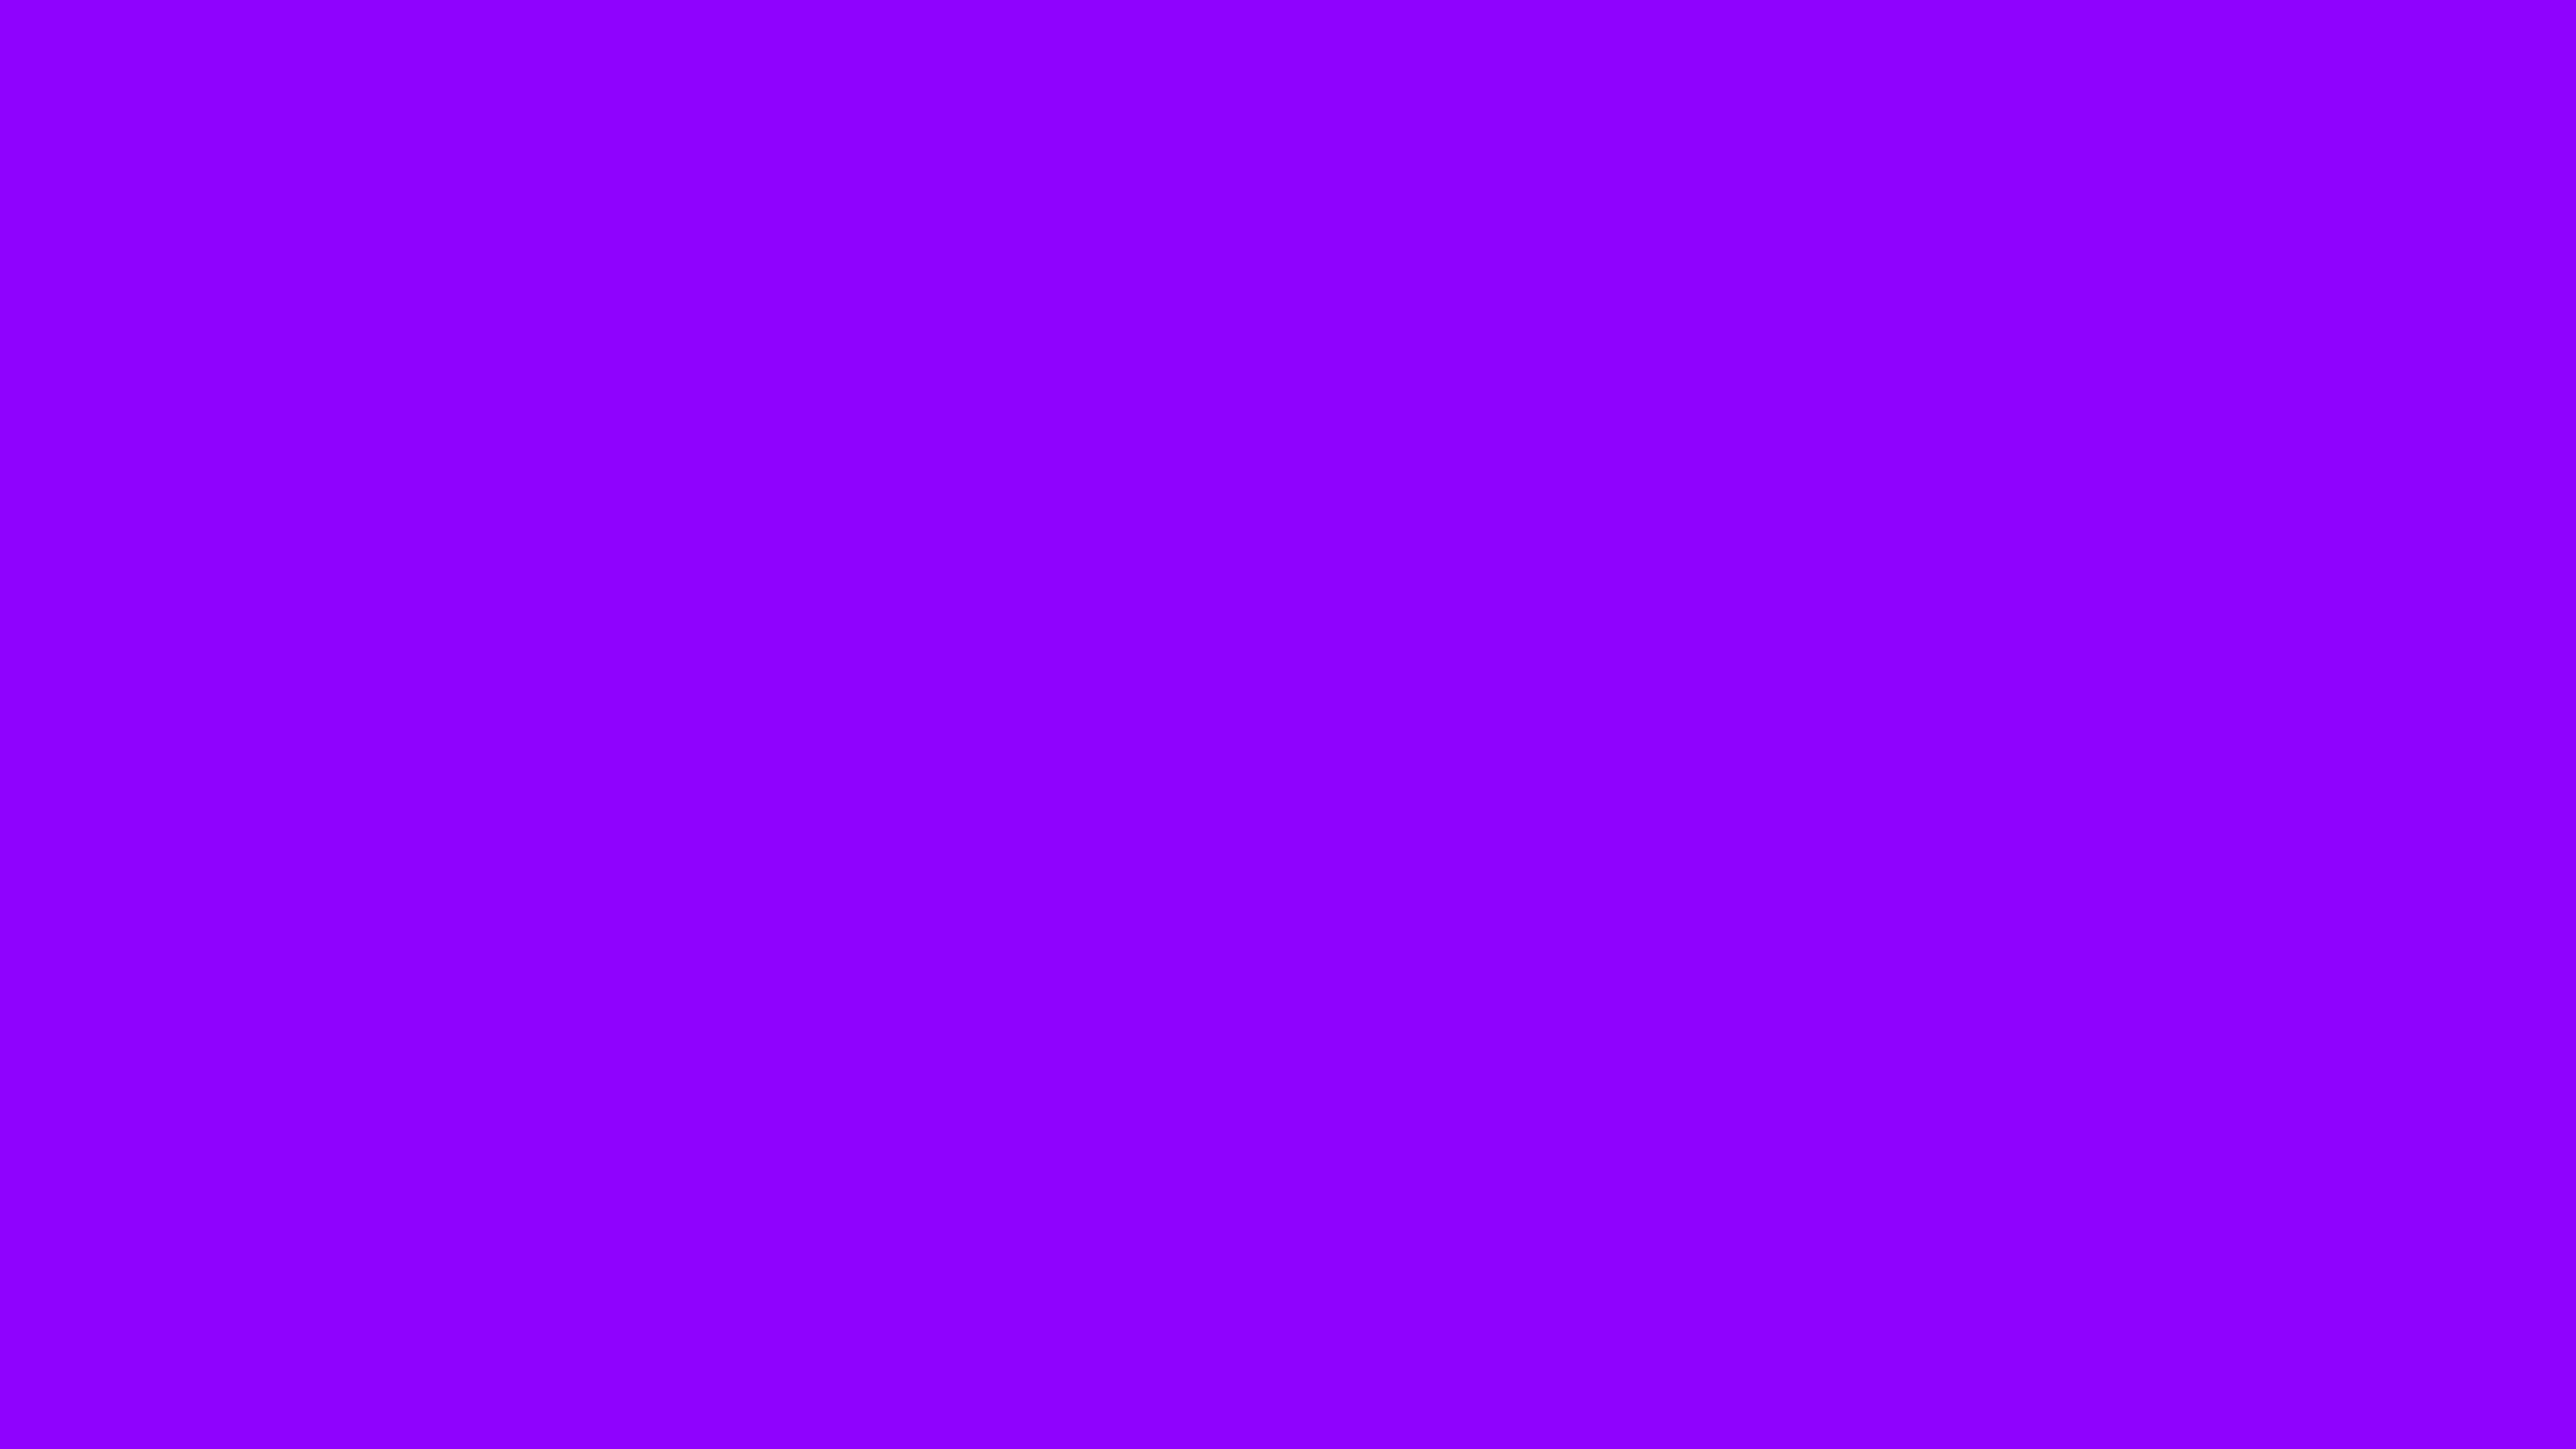 5120x2880 Electric Violet Solid Color Background